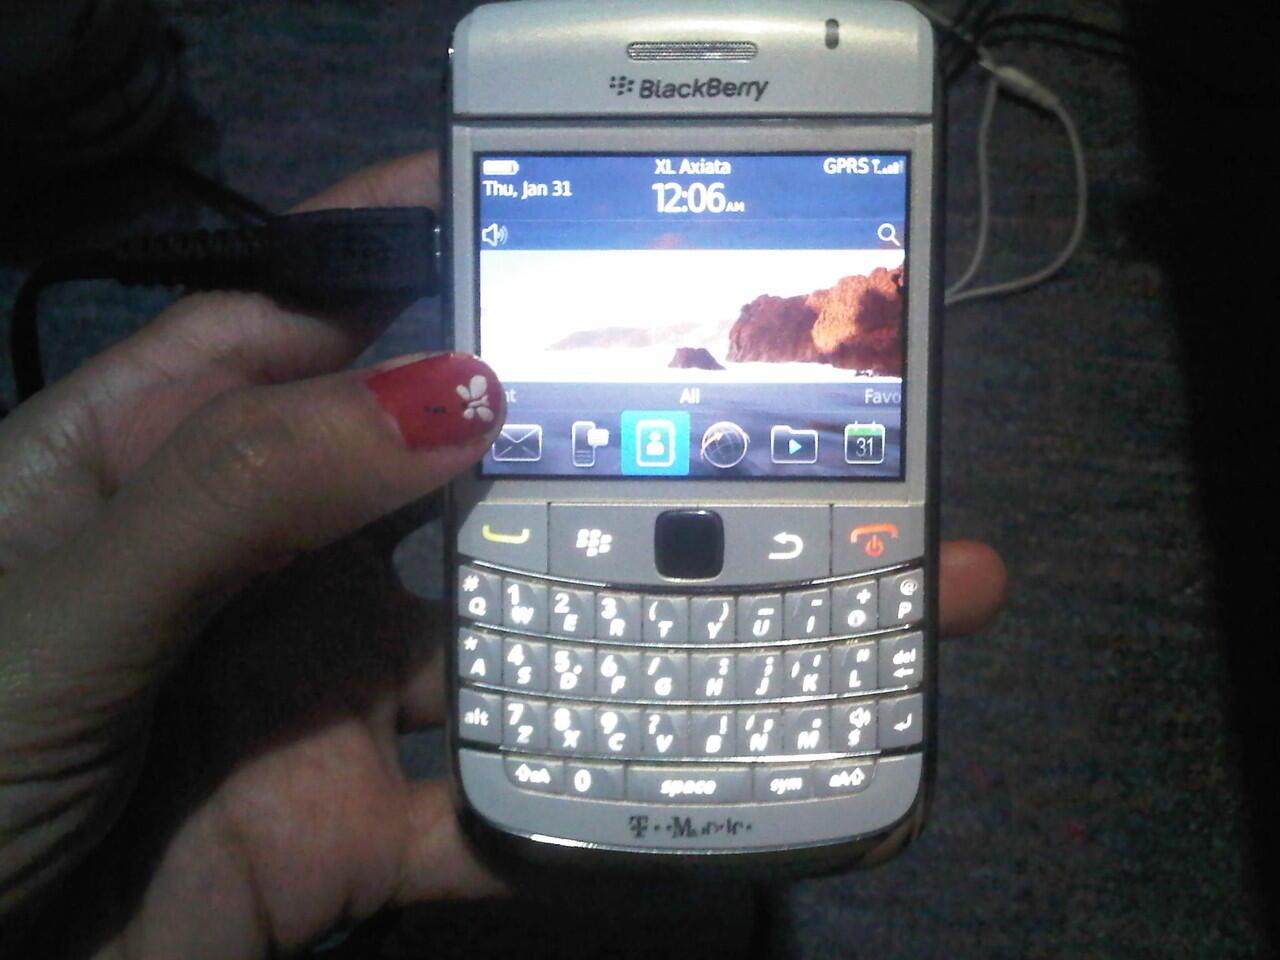 Onyx White/putih ex t-mobile 2,6